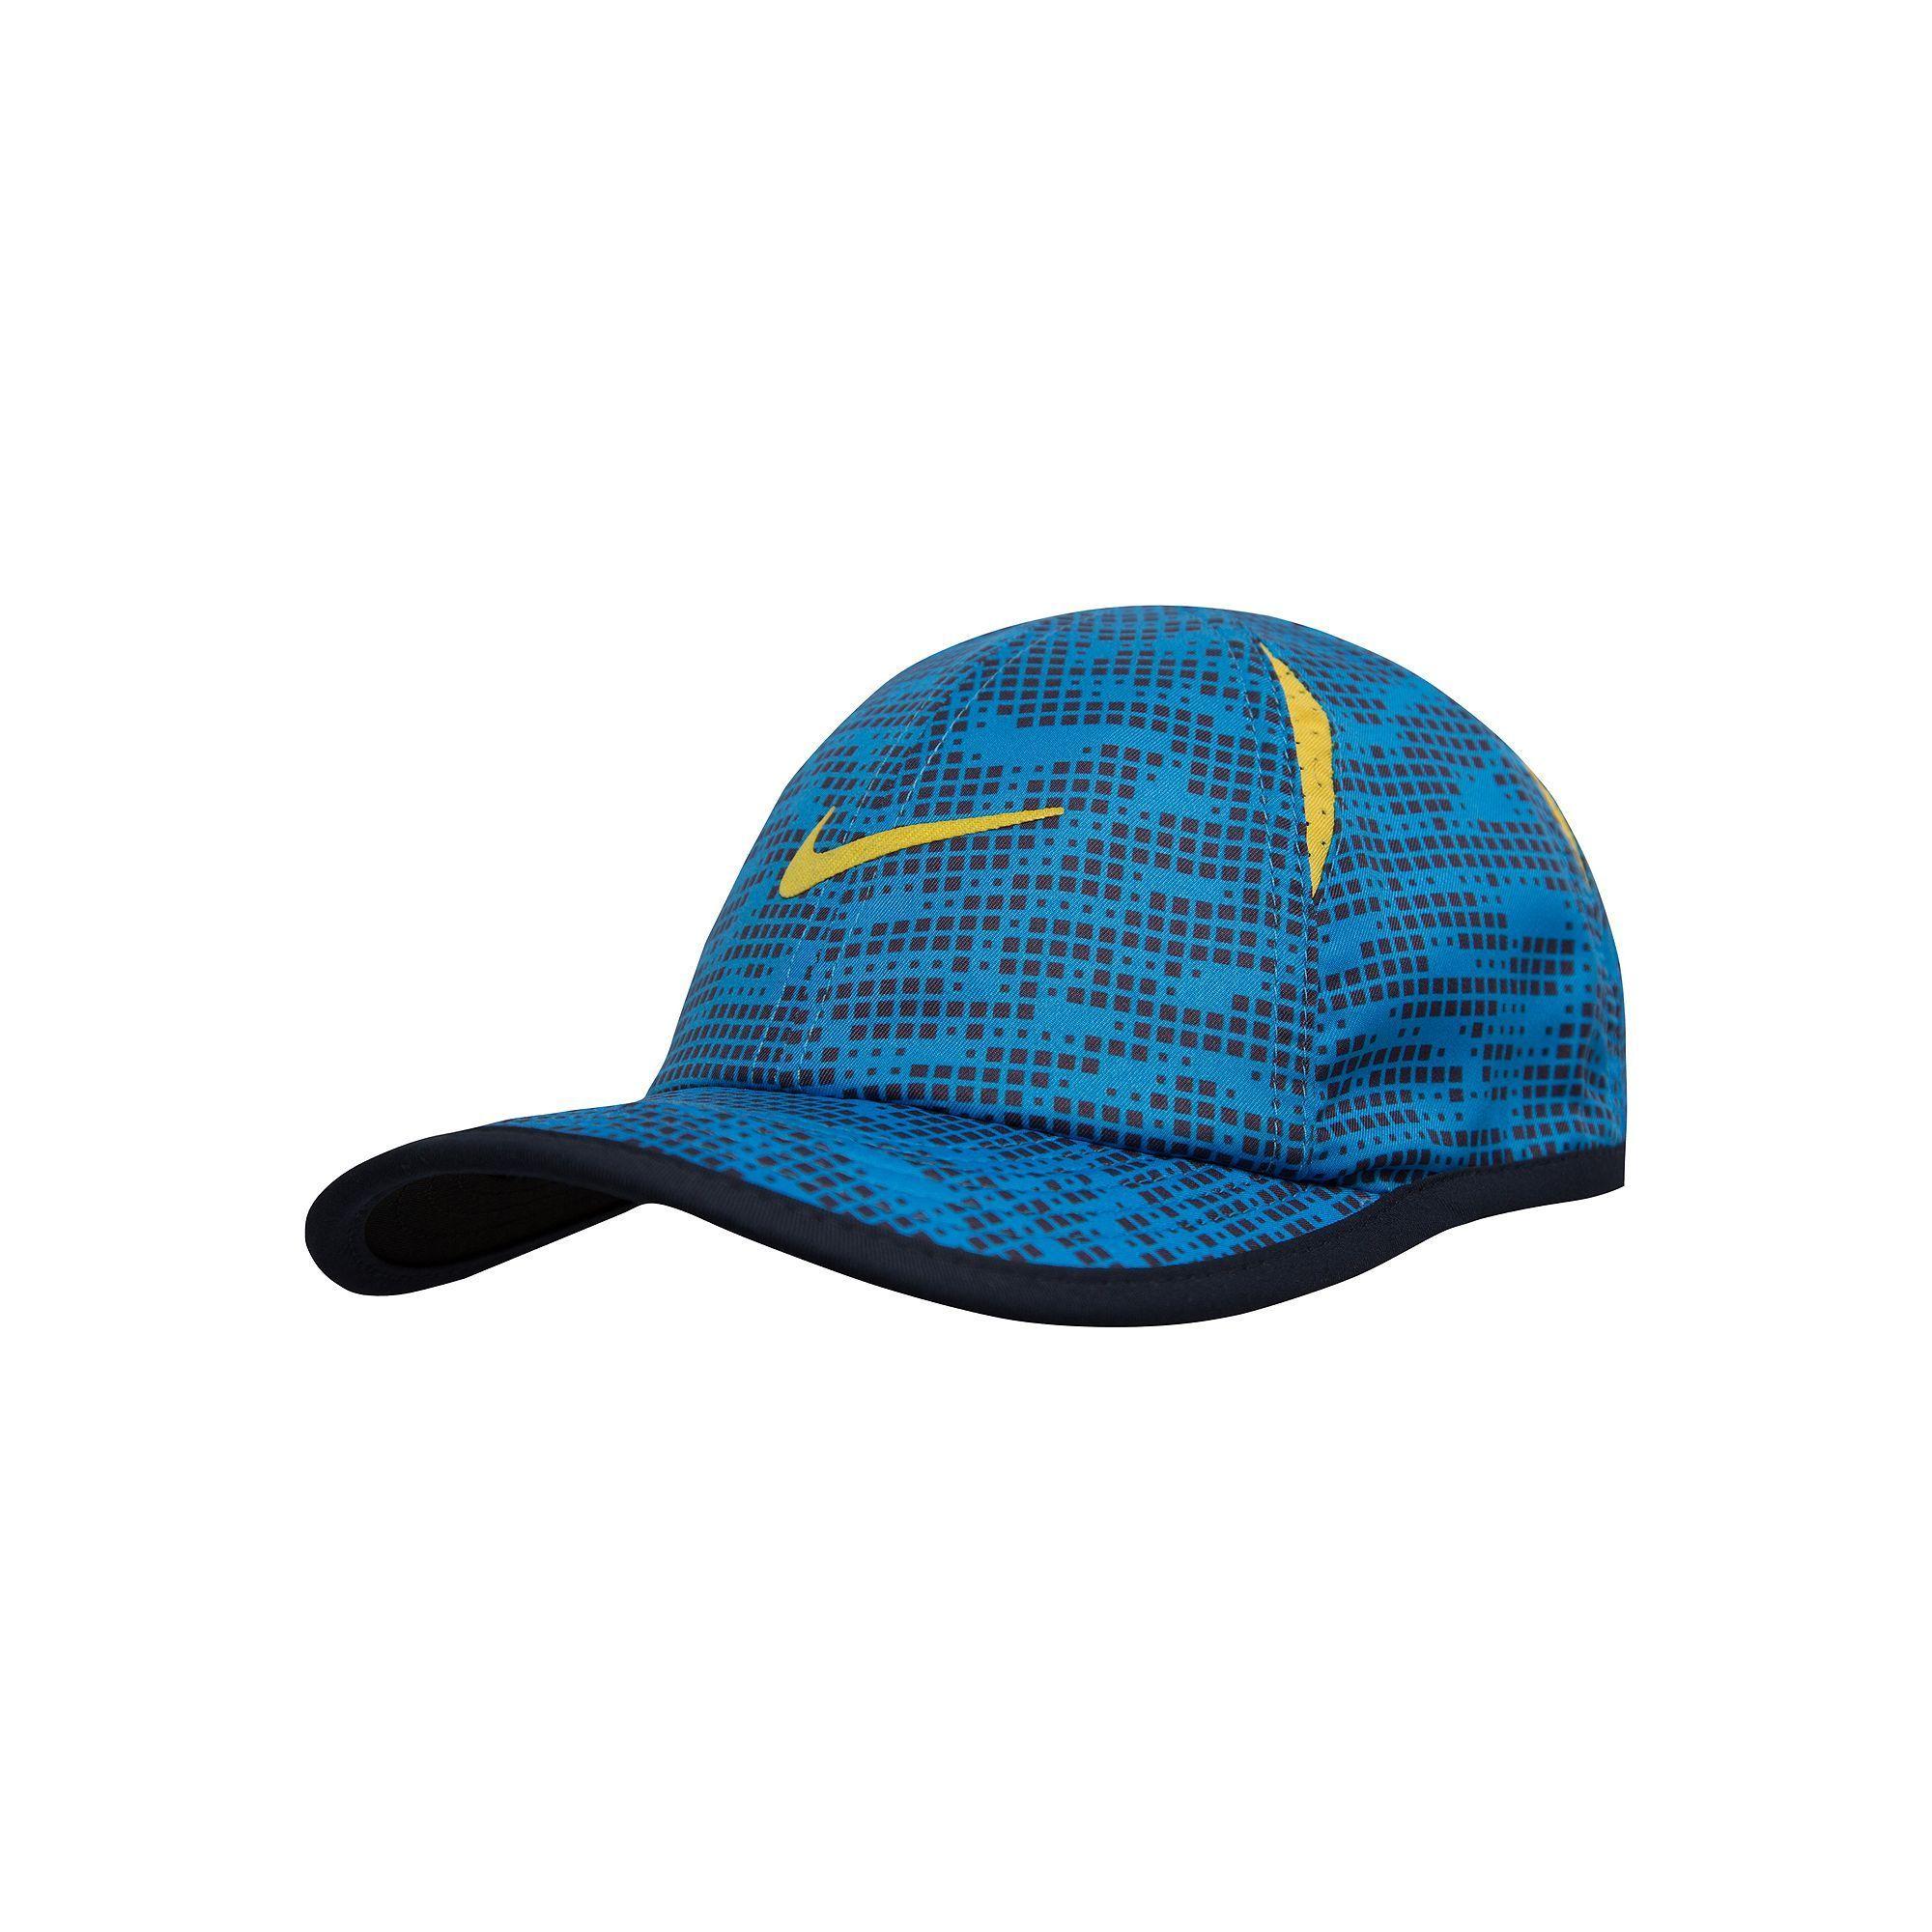 5d3cfea6 Baby Boy Nike Dri-FIT Printed Feather Light Cap, Size: 12-24MONTH,  Turquoise/Blue (Turq/Aqua)